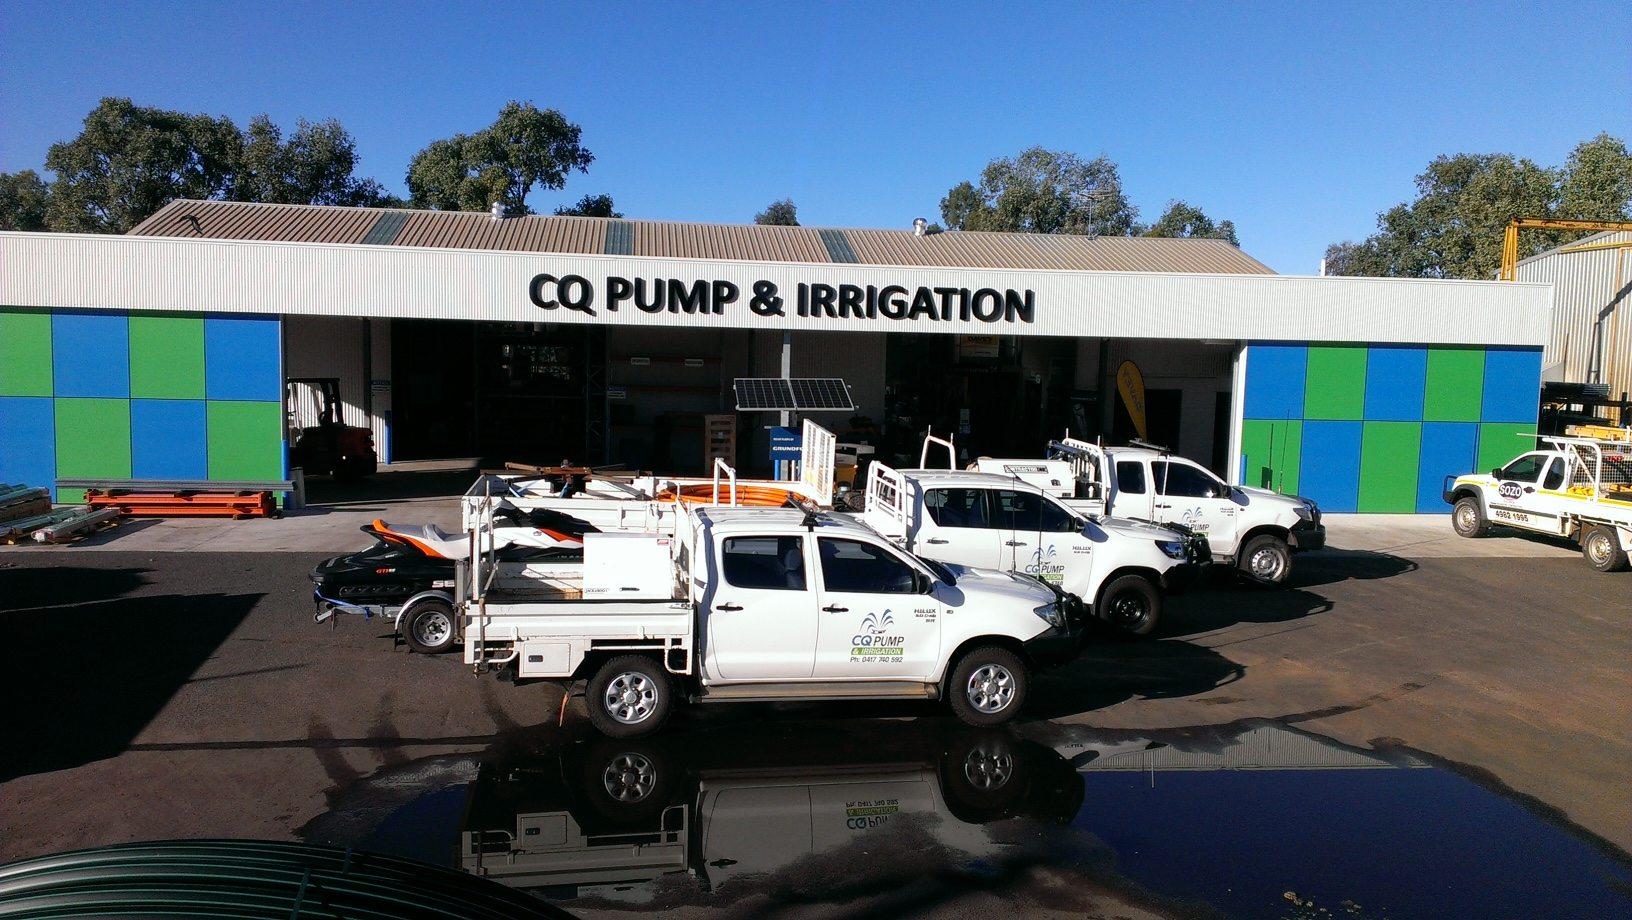 CQ Pump & Irrigation